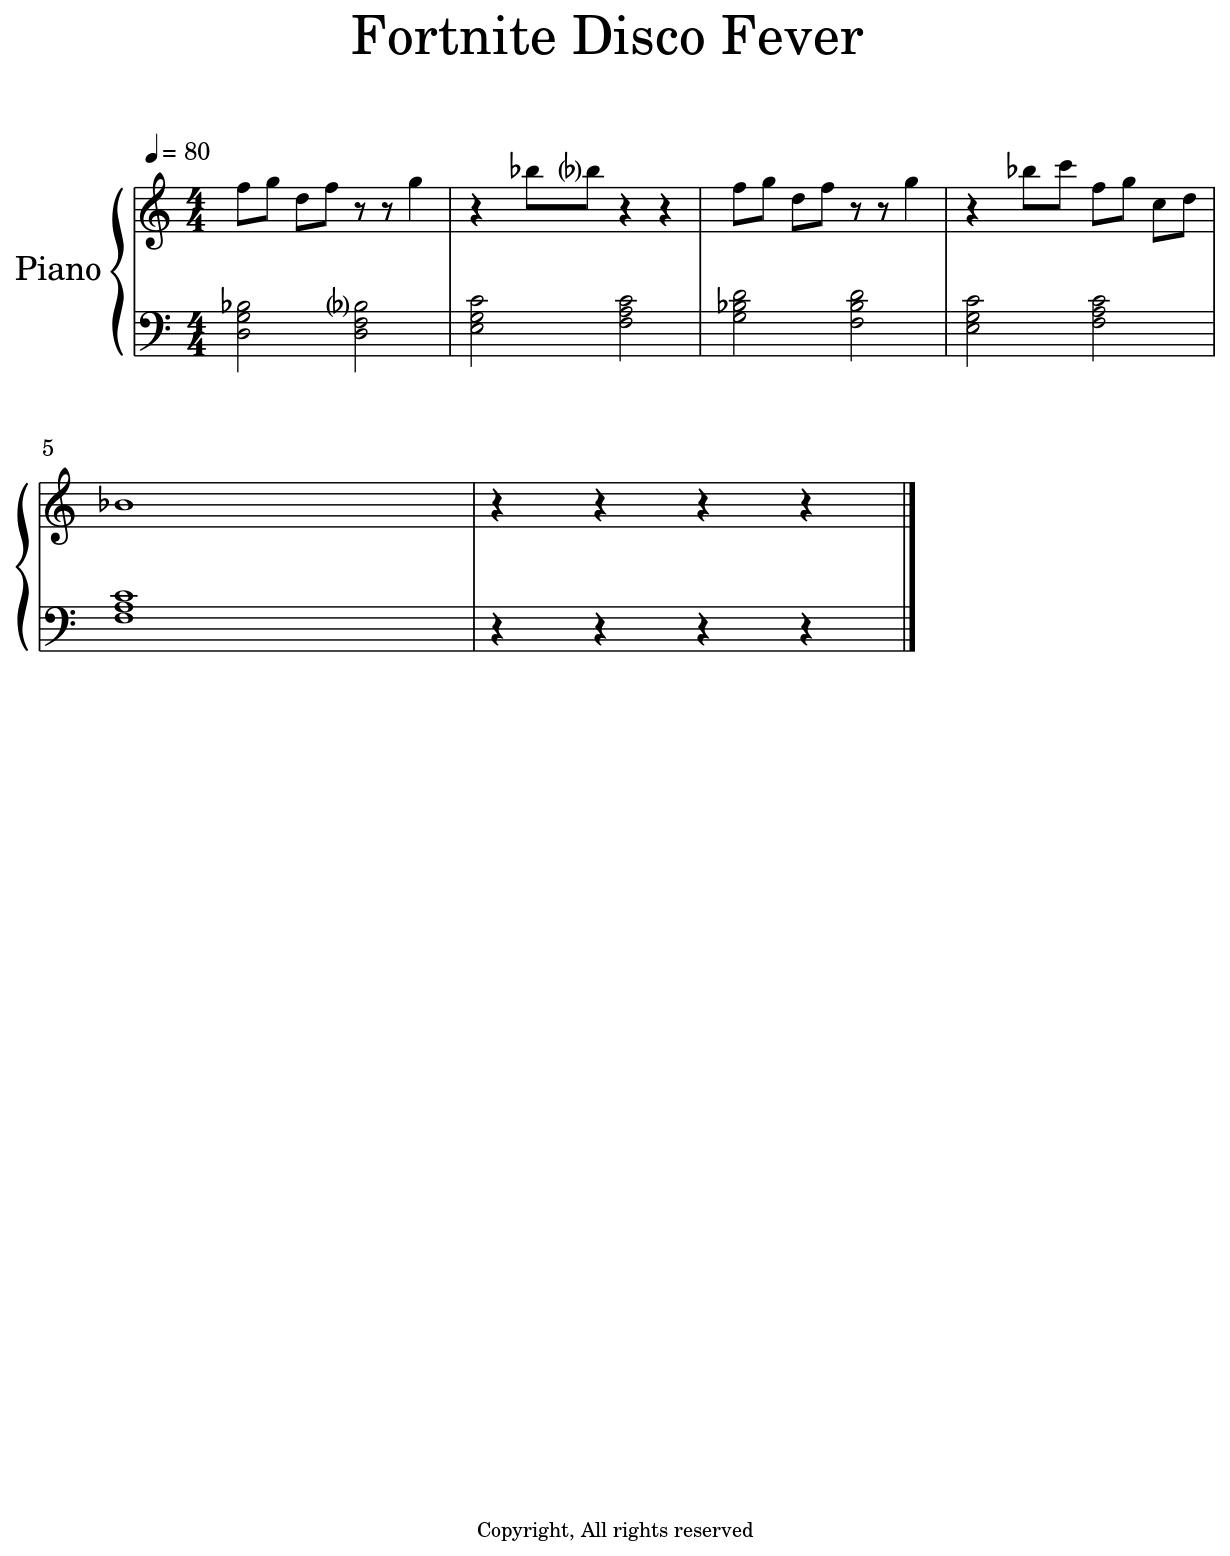 Fortnite Dances Trumpet Music Easy Www Miifotos Com